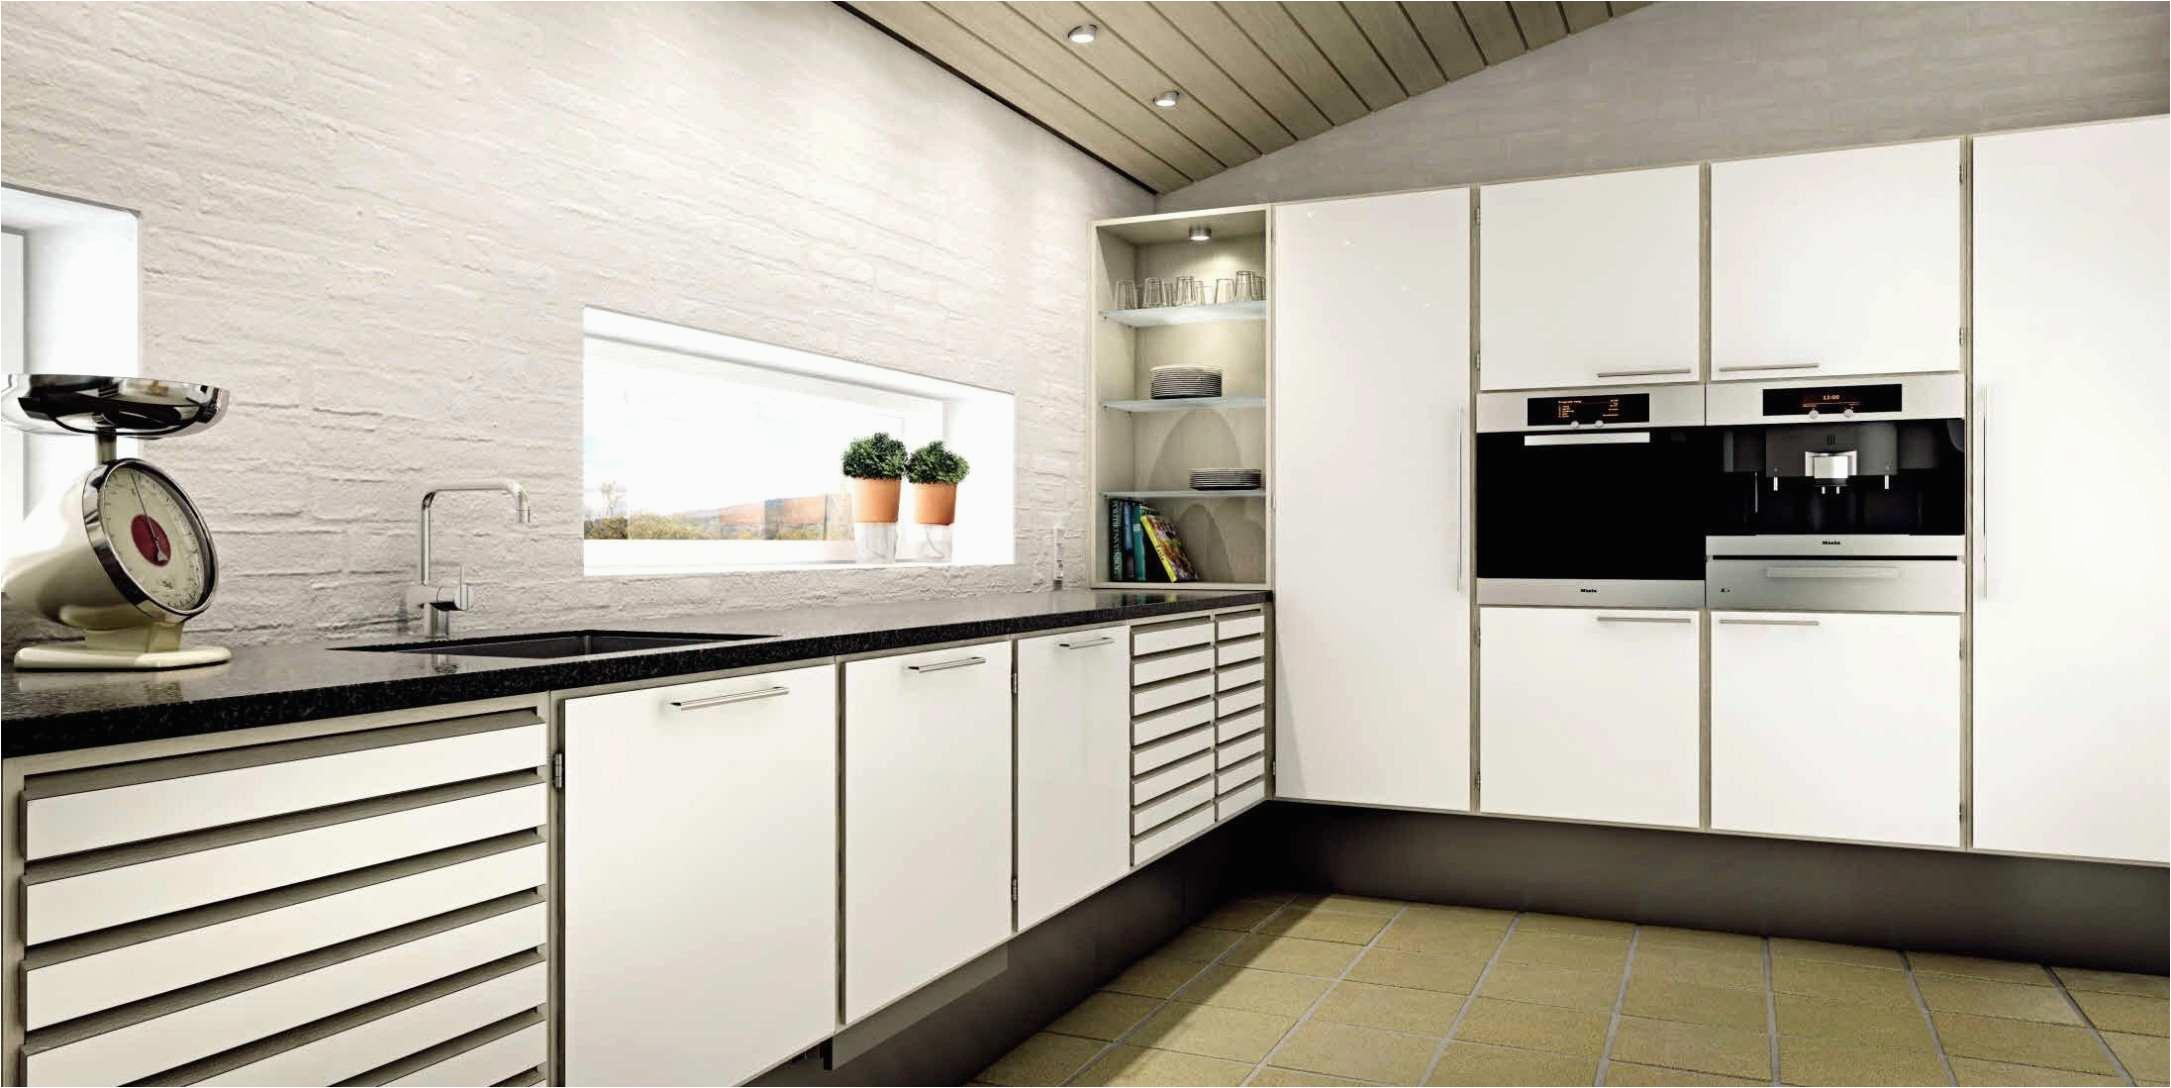 wandgestaltung kuche modern schon kuche creme vianova project of wandgestaltung kuche modern